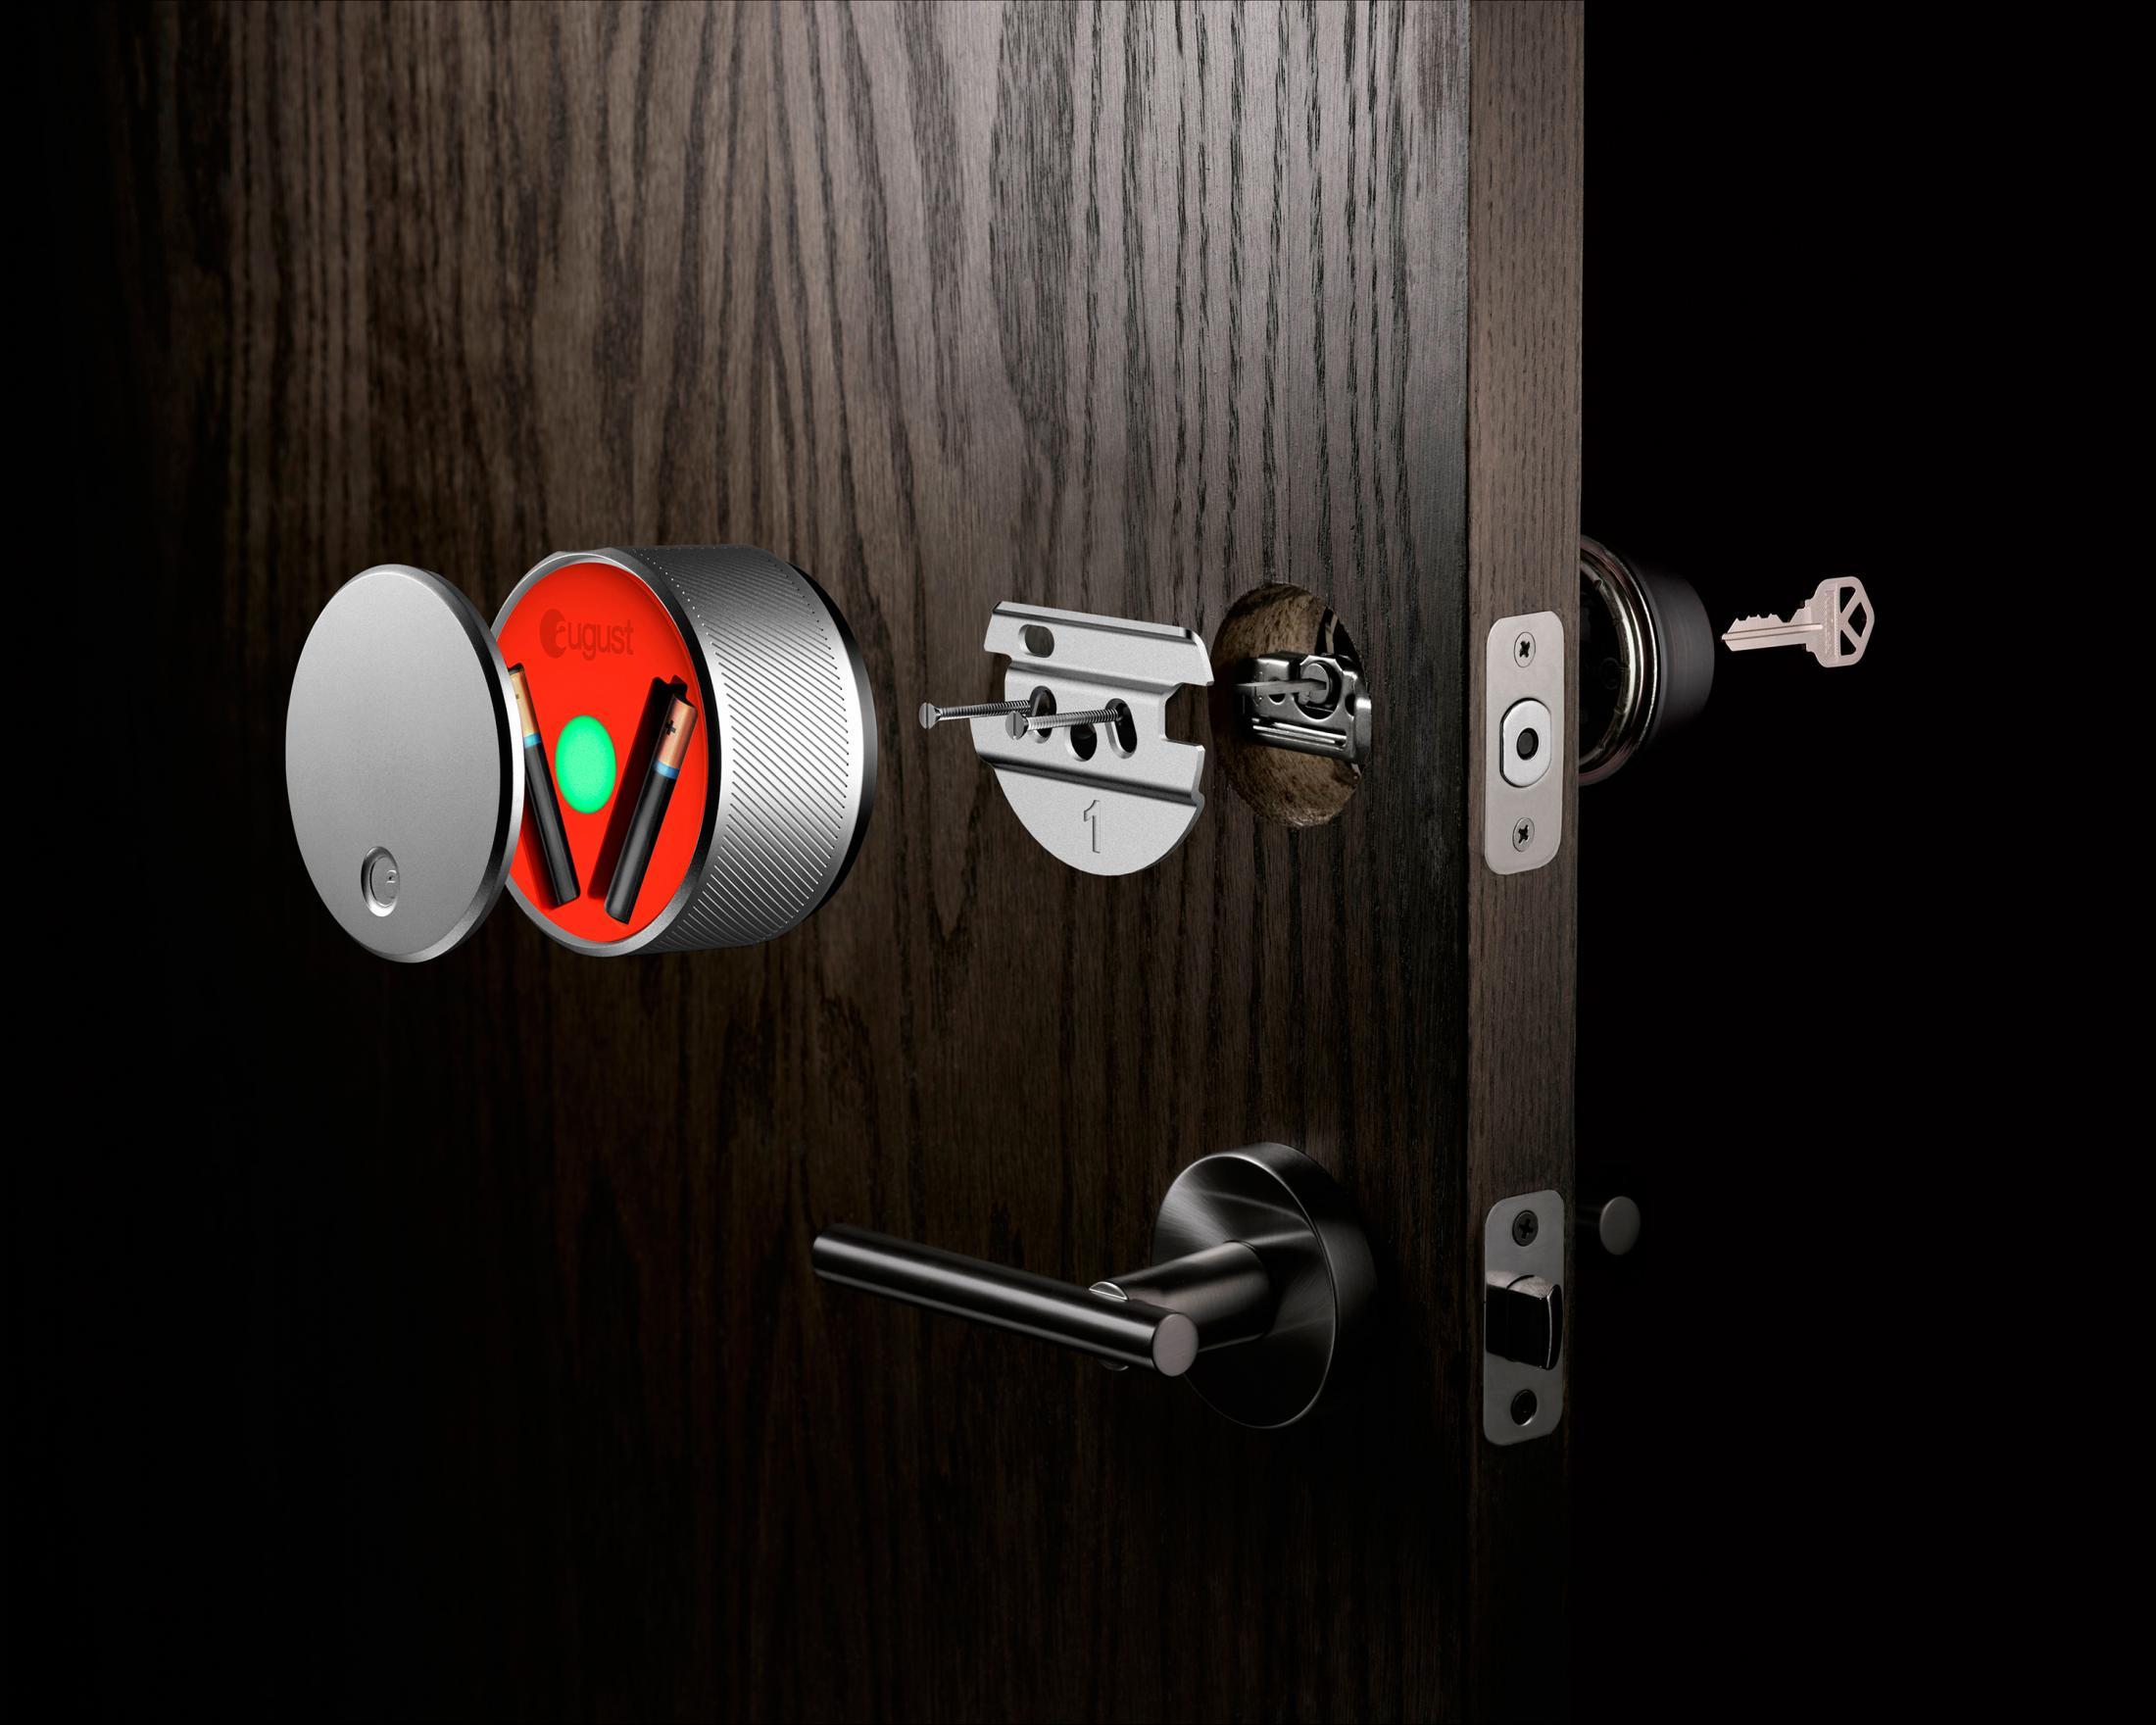 Thumbnail for August Smart Lock